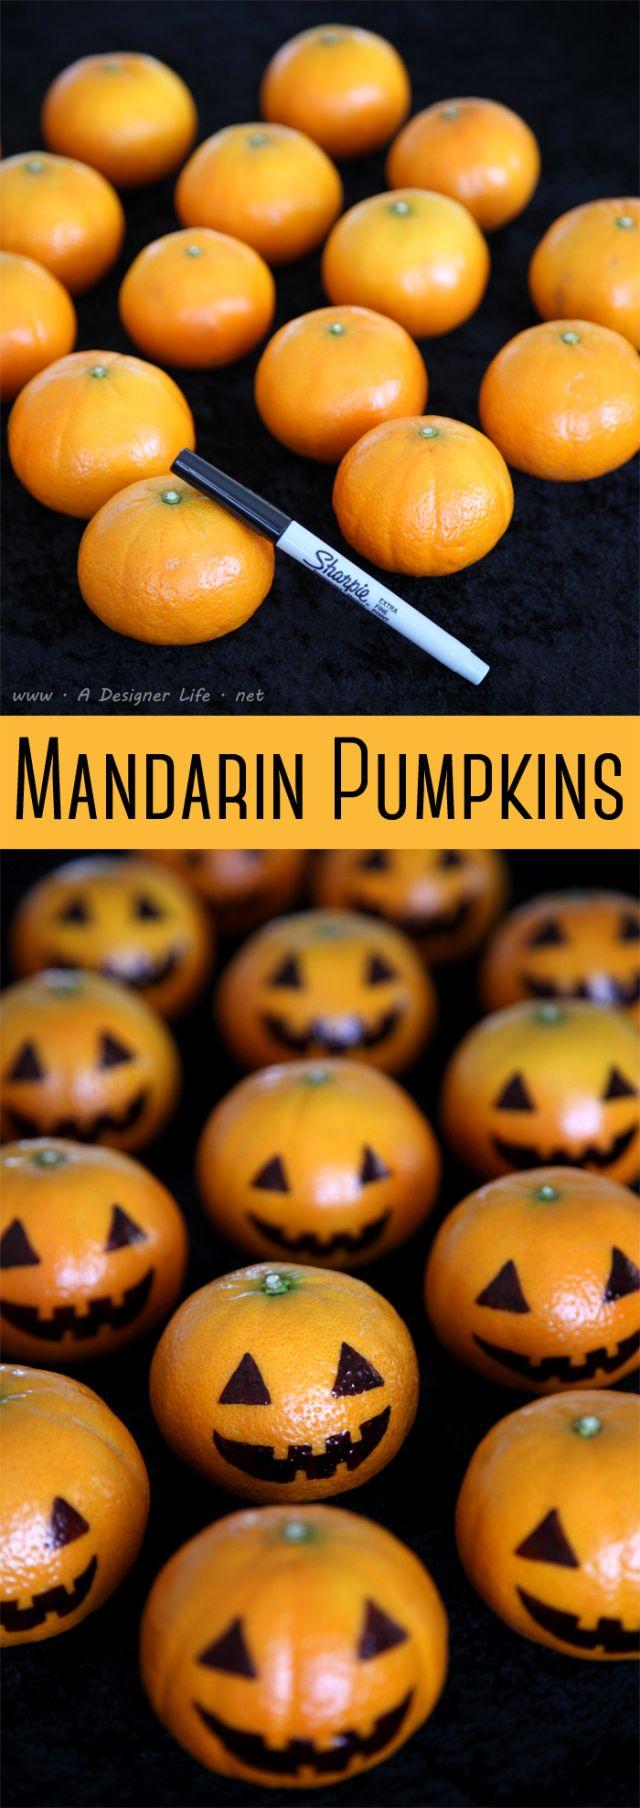 Mandarin Pumpkins | 5 Easy Halloween Food Ideas